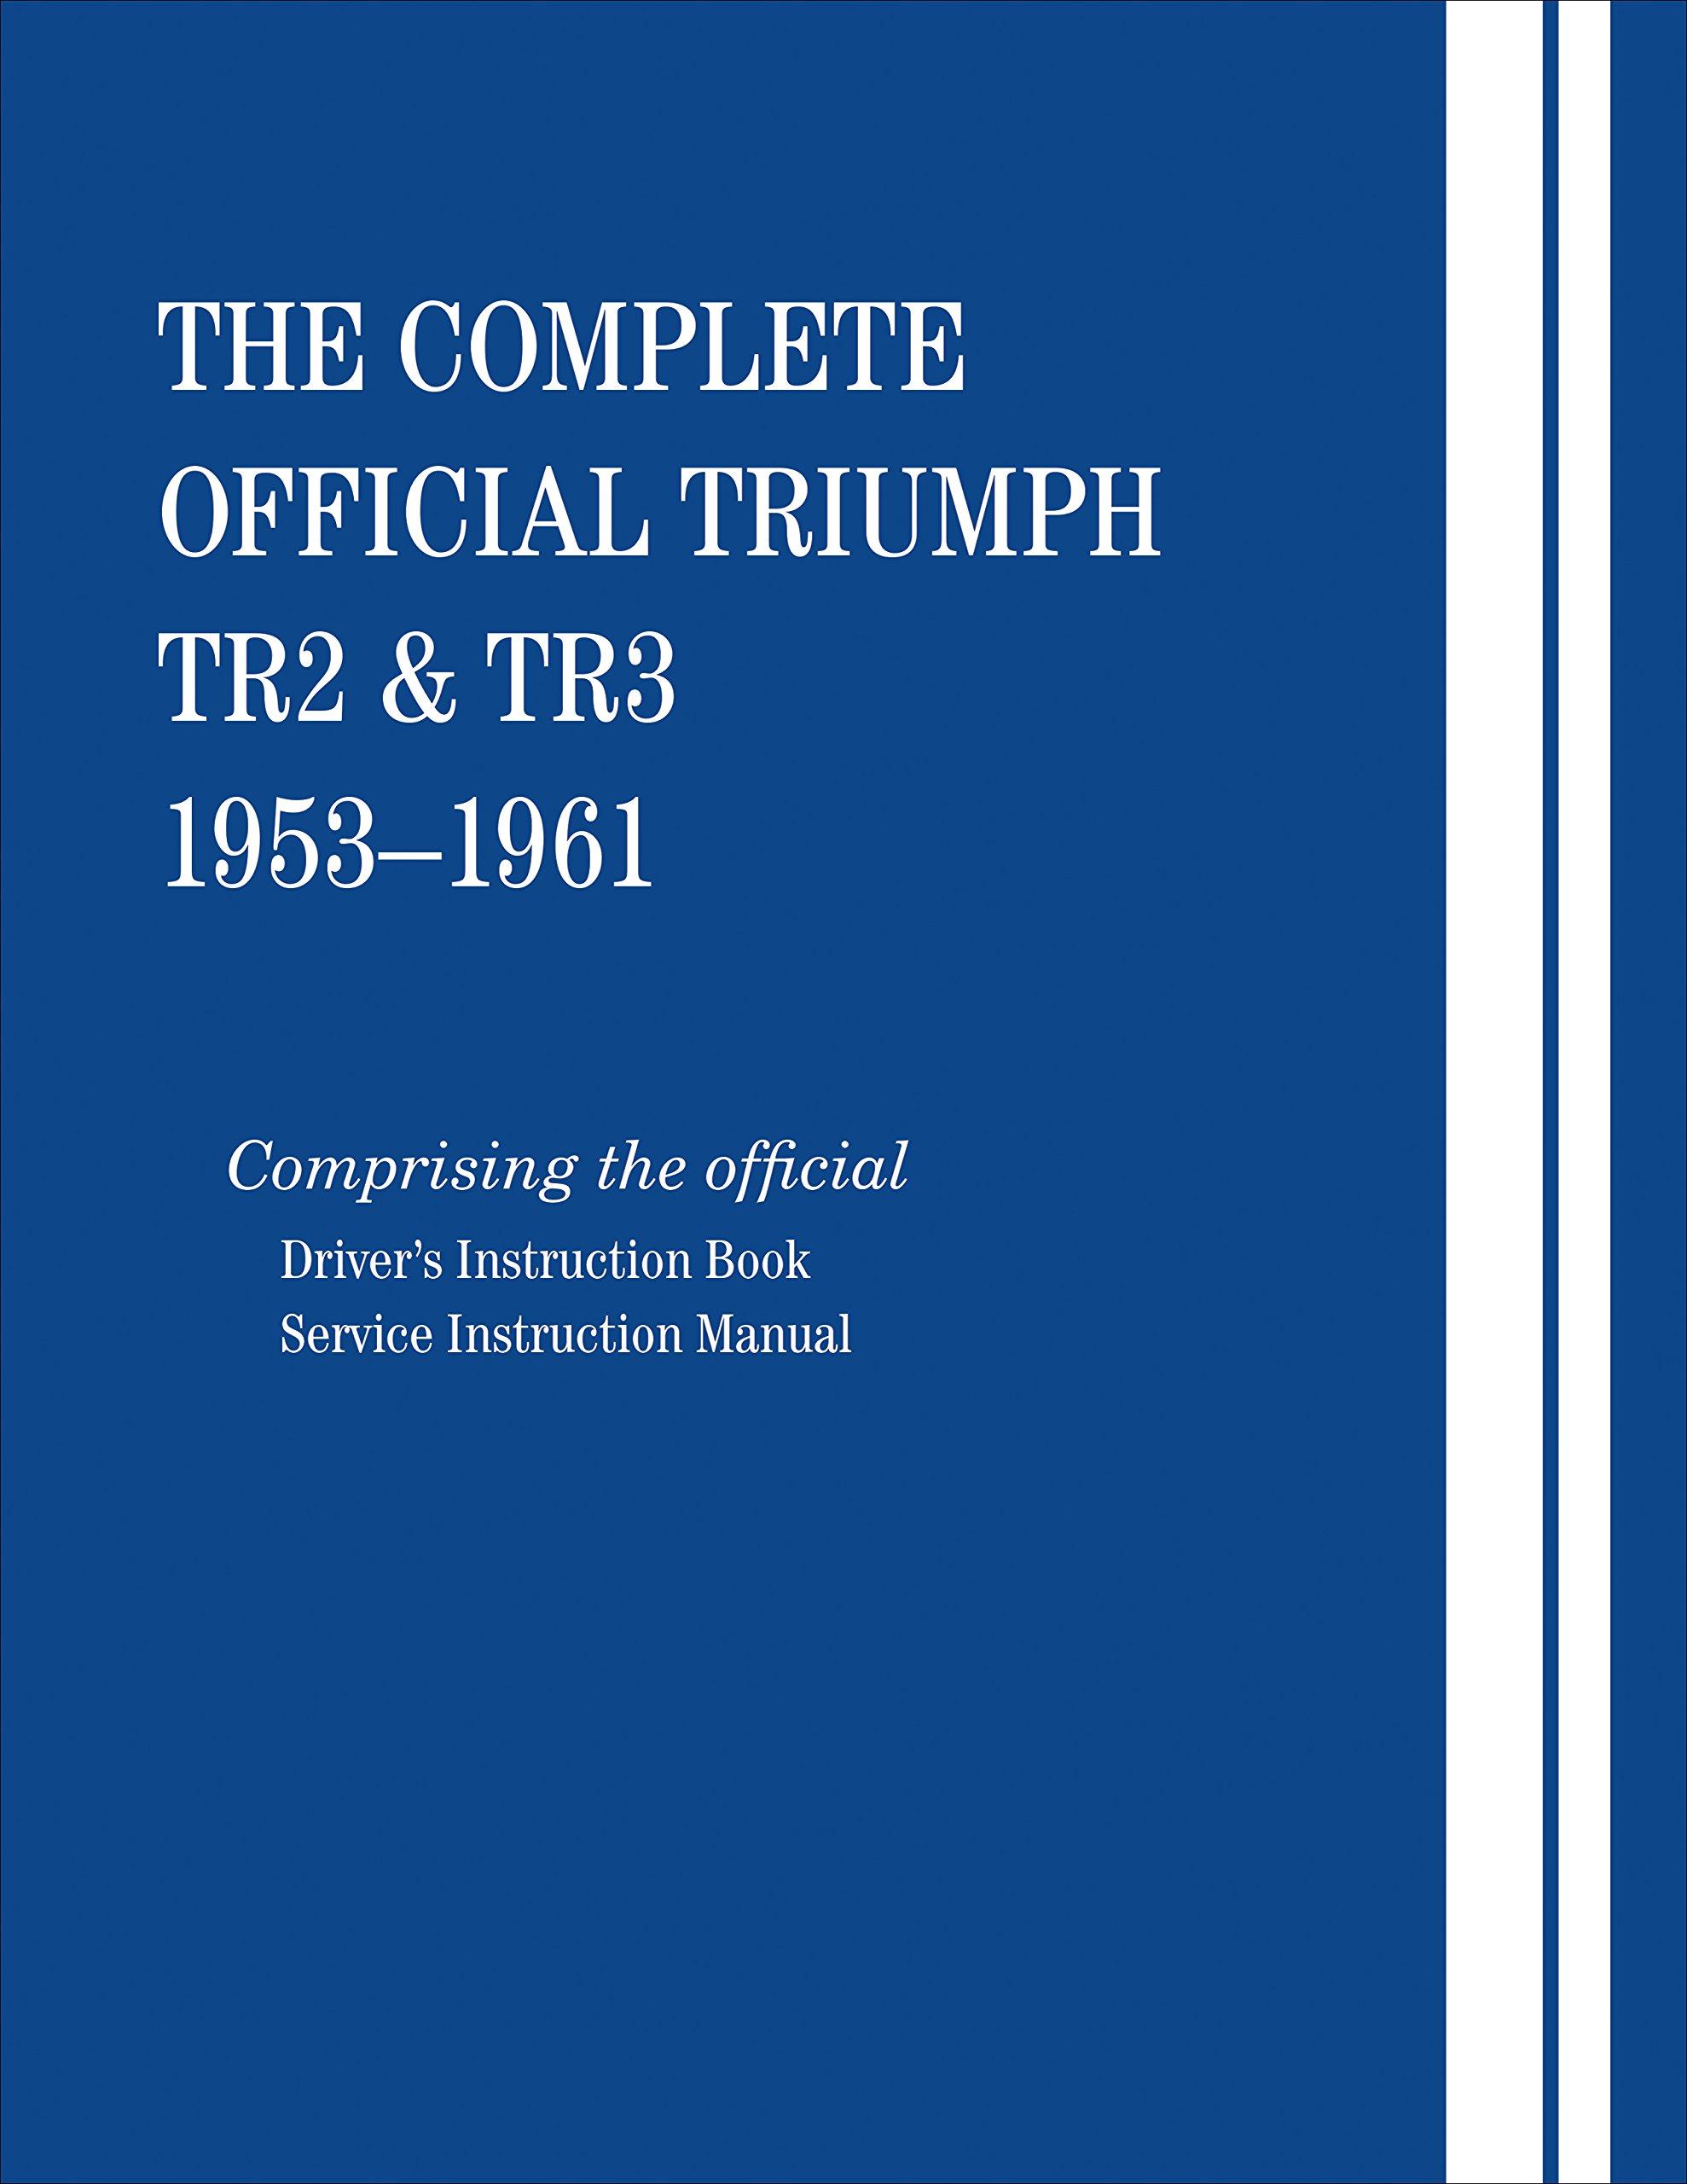 The Complete Official Triumph TR2 & TR3: 1953, 1954, 1955, 1956, 1957,  1958, 1959, 1960, 1961: British Leyland Motors: 9780837617503: Amazon.com:  Books